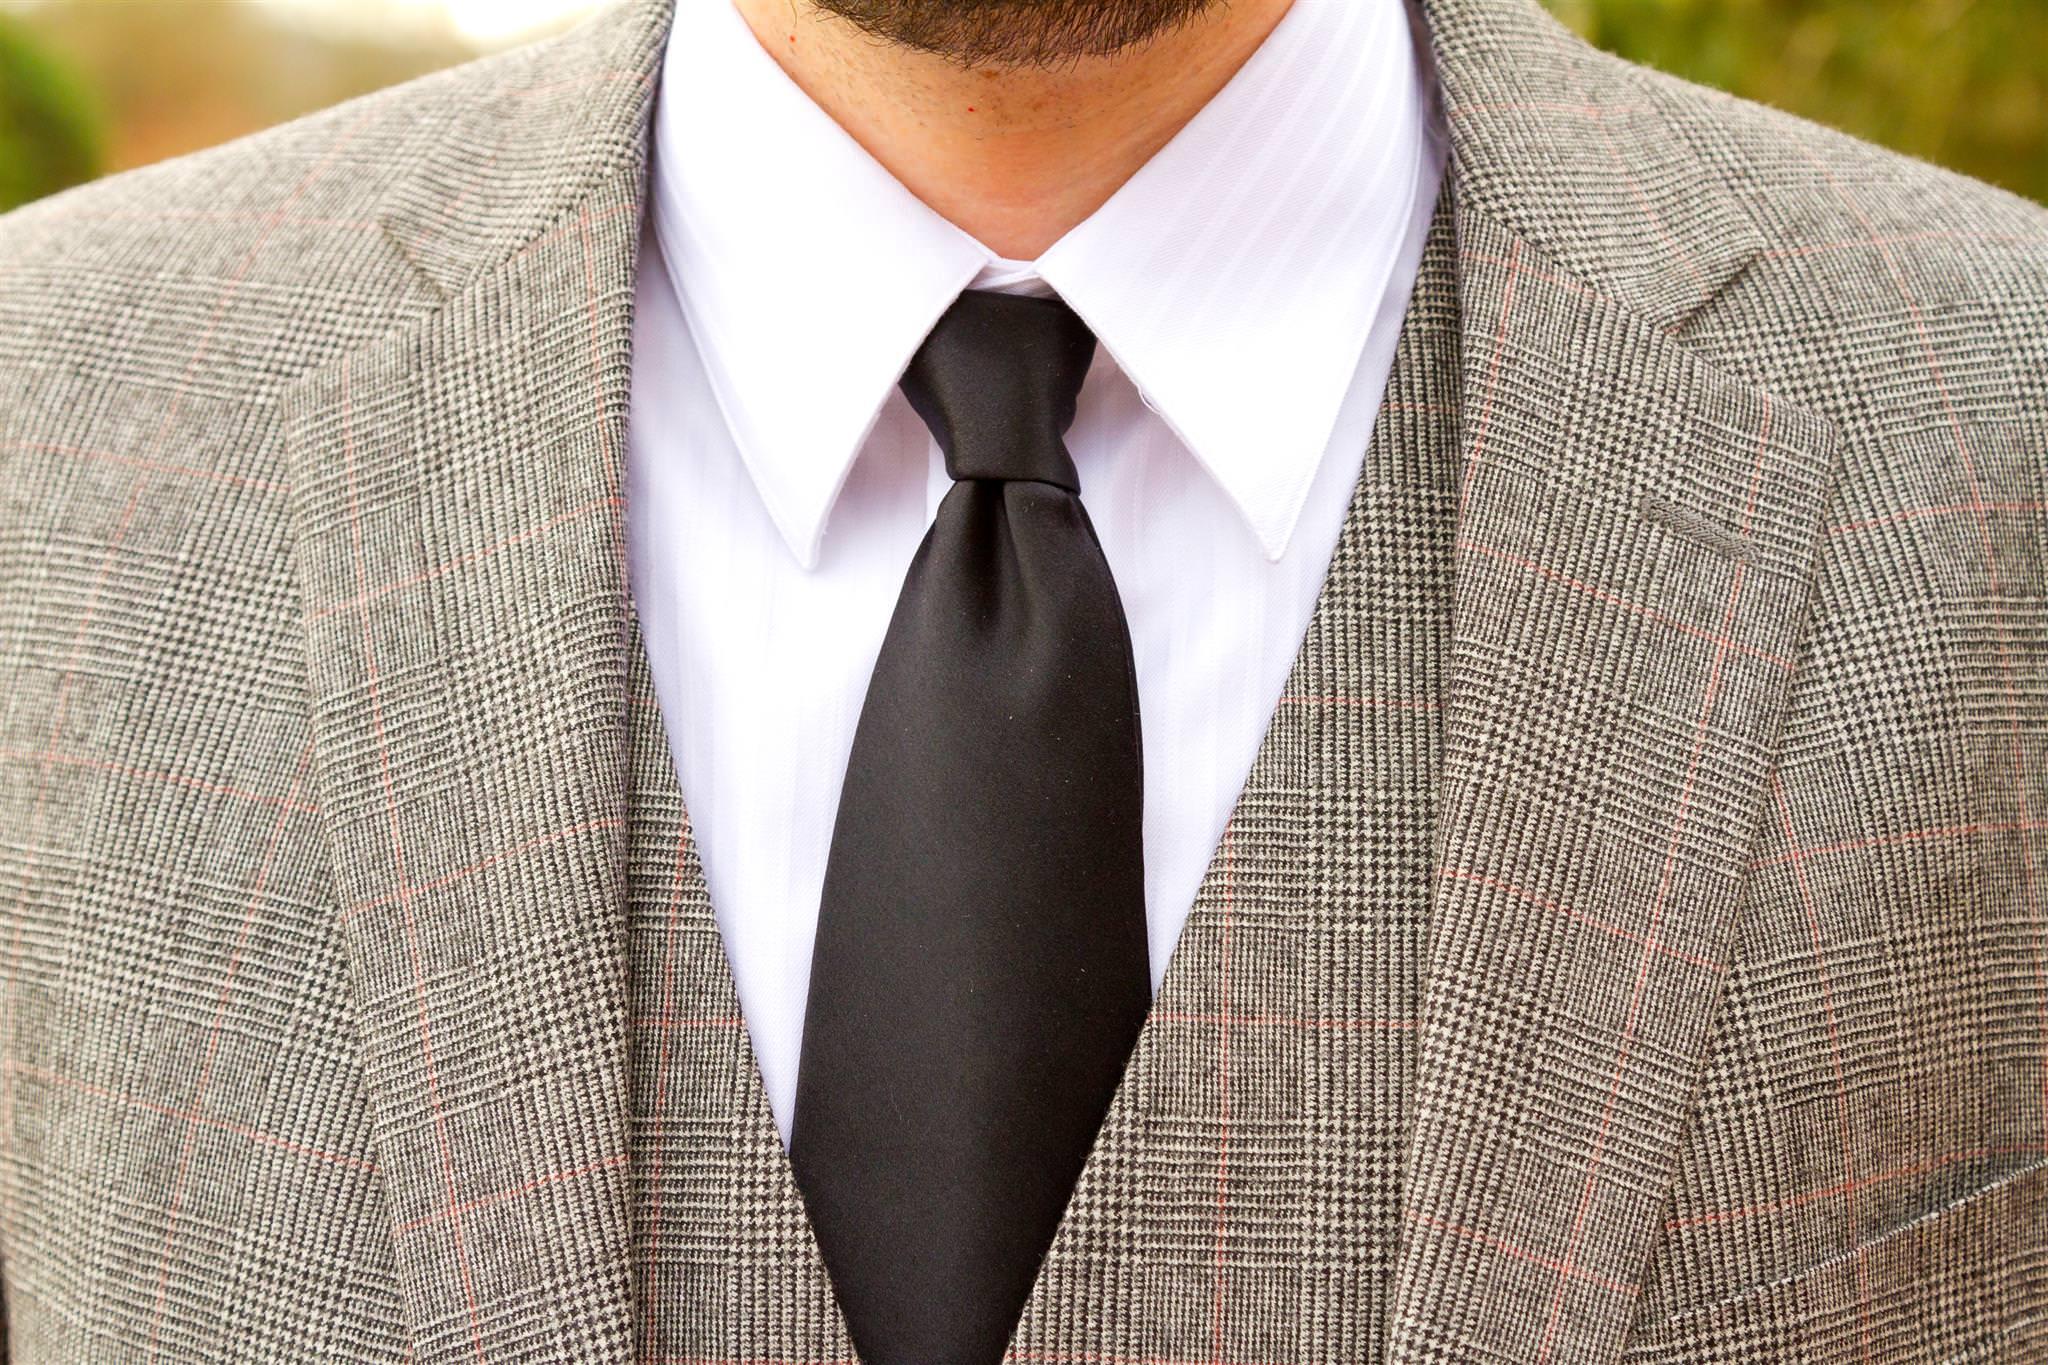 Tweed Suit with Black Tie